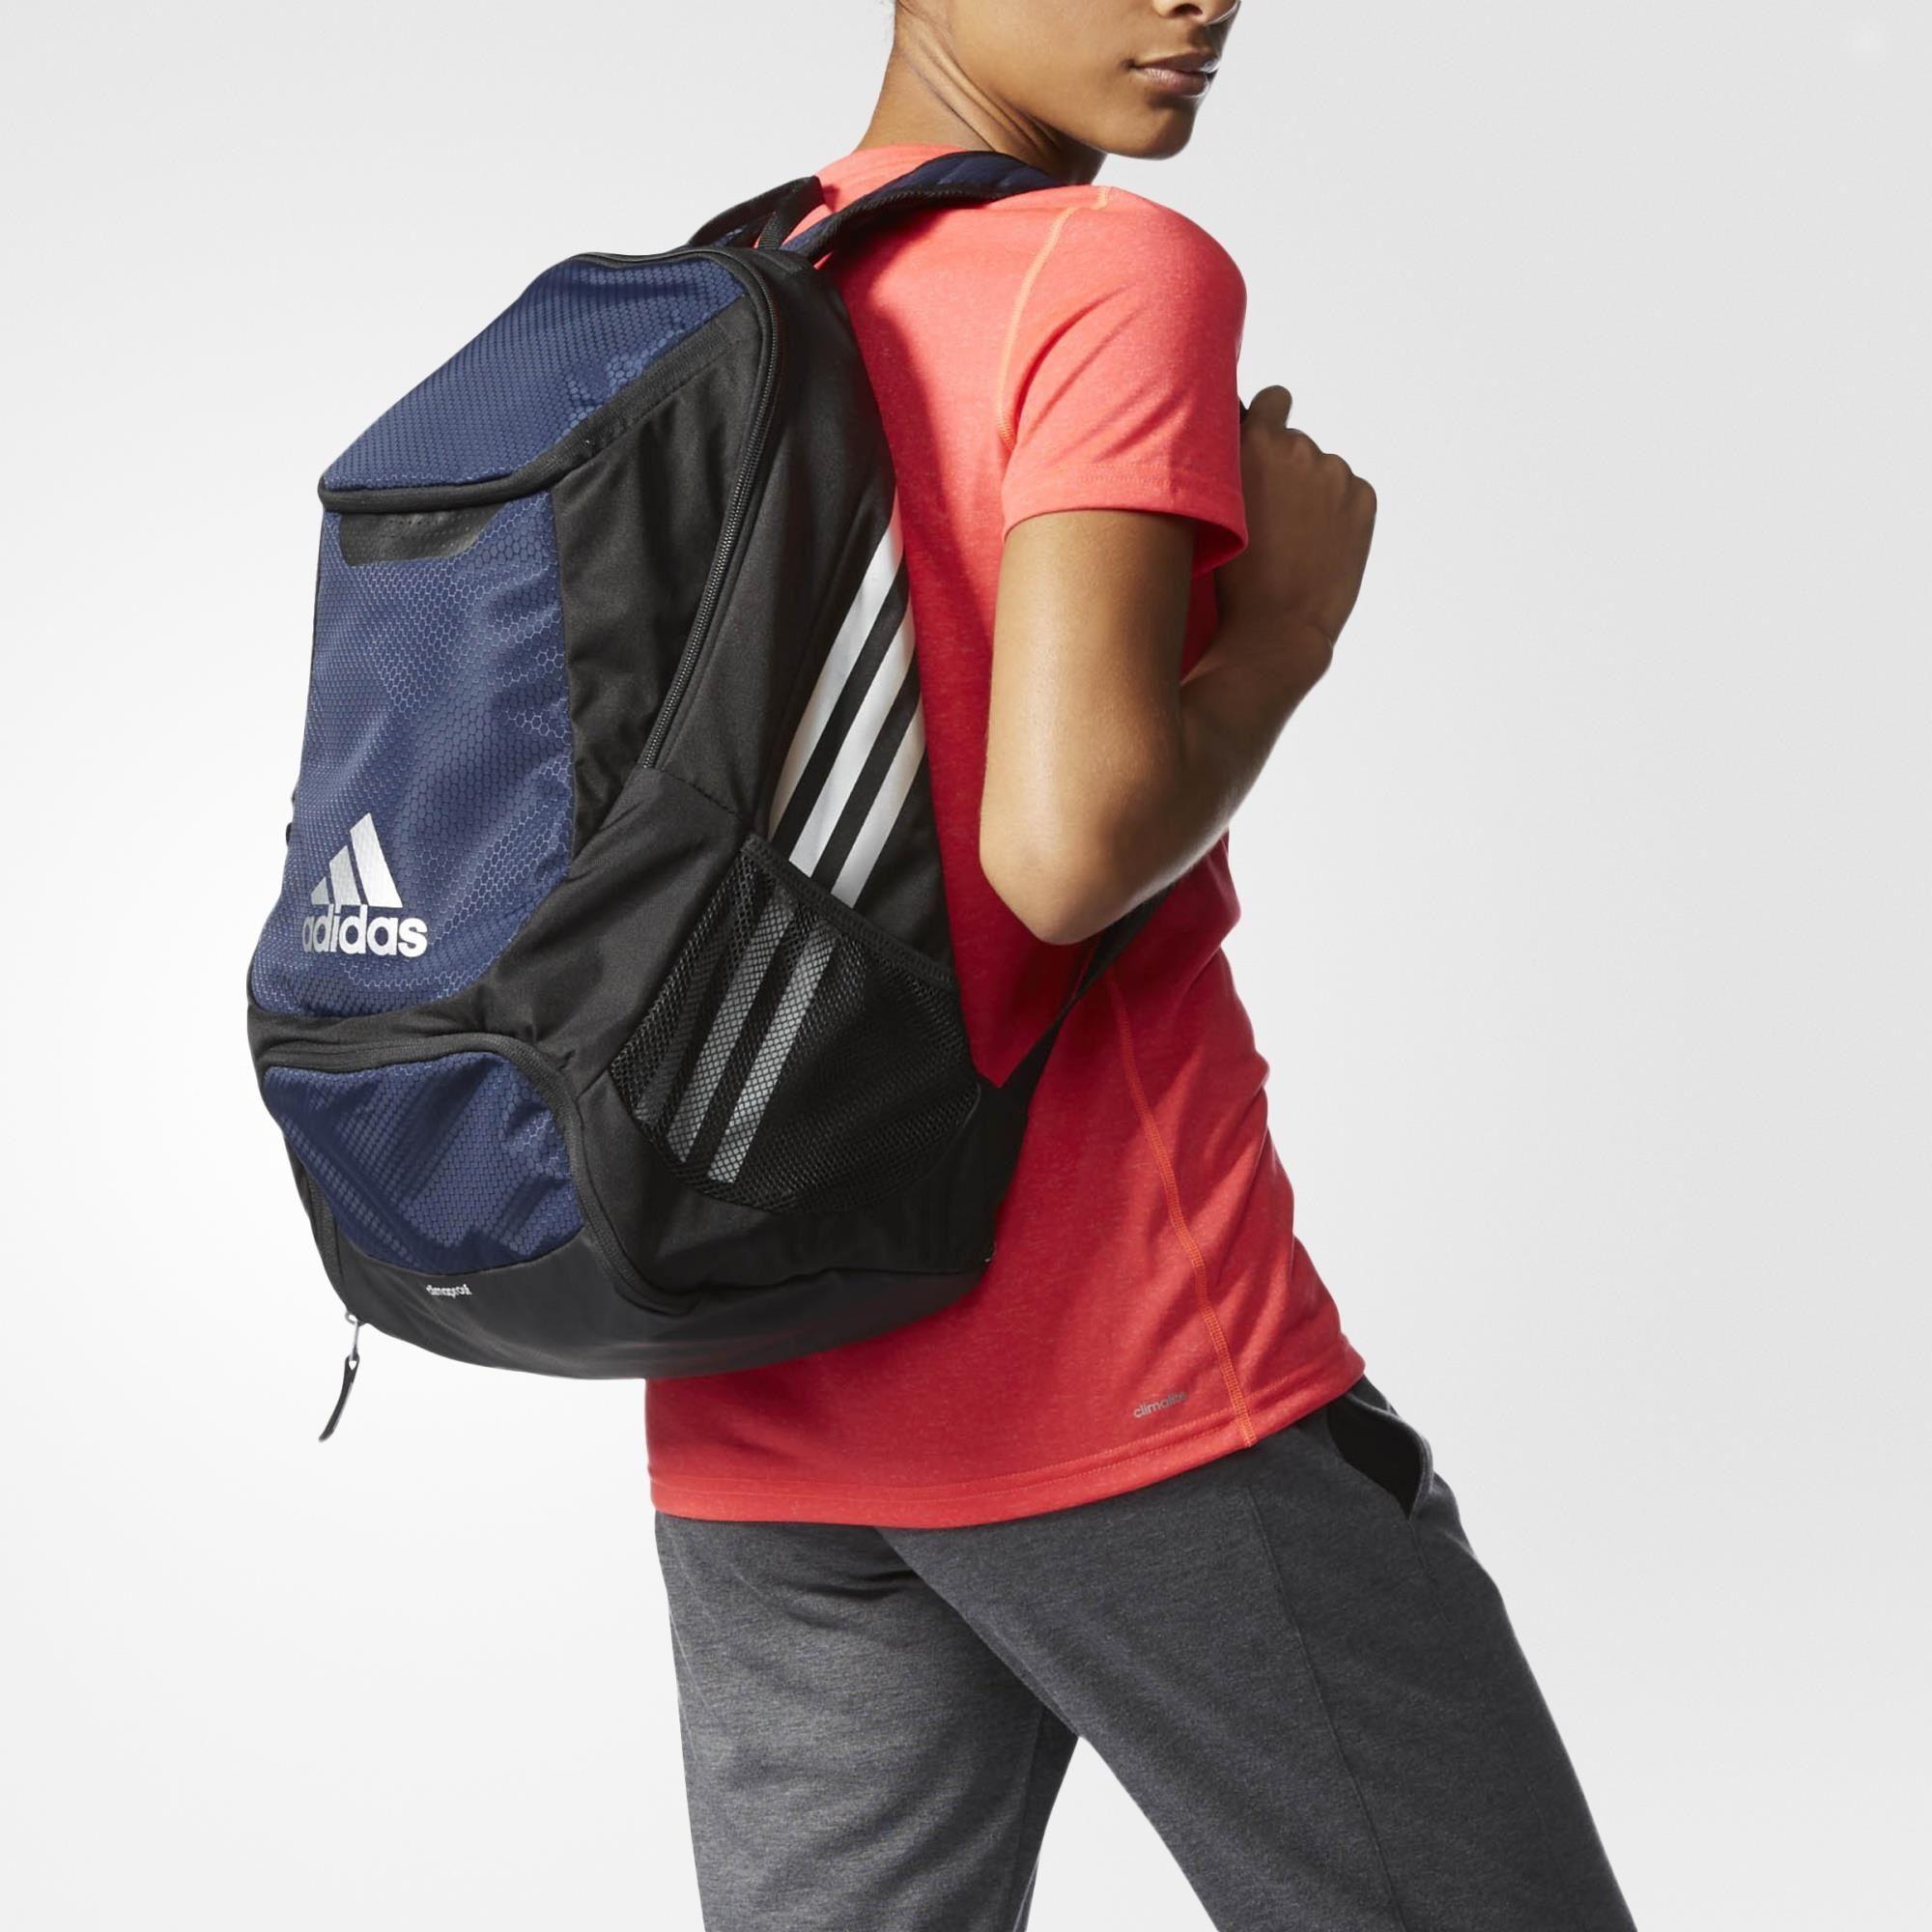 7a3996adcac adidas stadium team backpack custom   Défi J arrête, j y gagne!